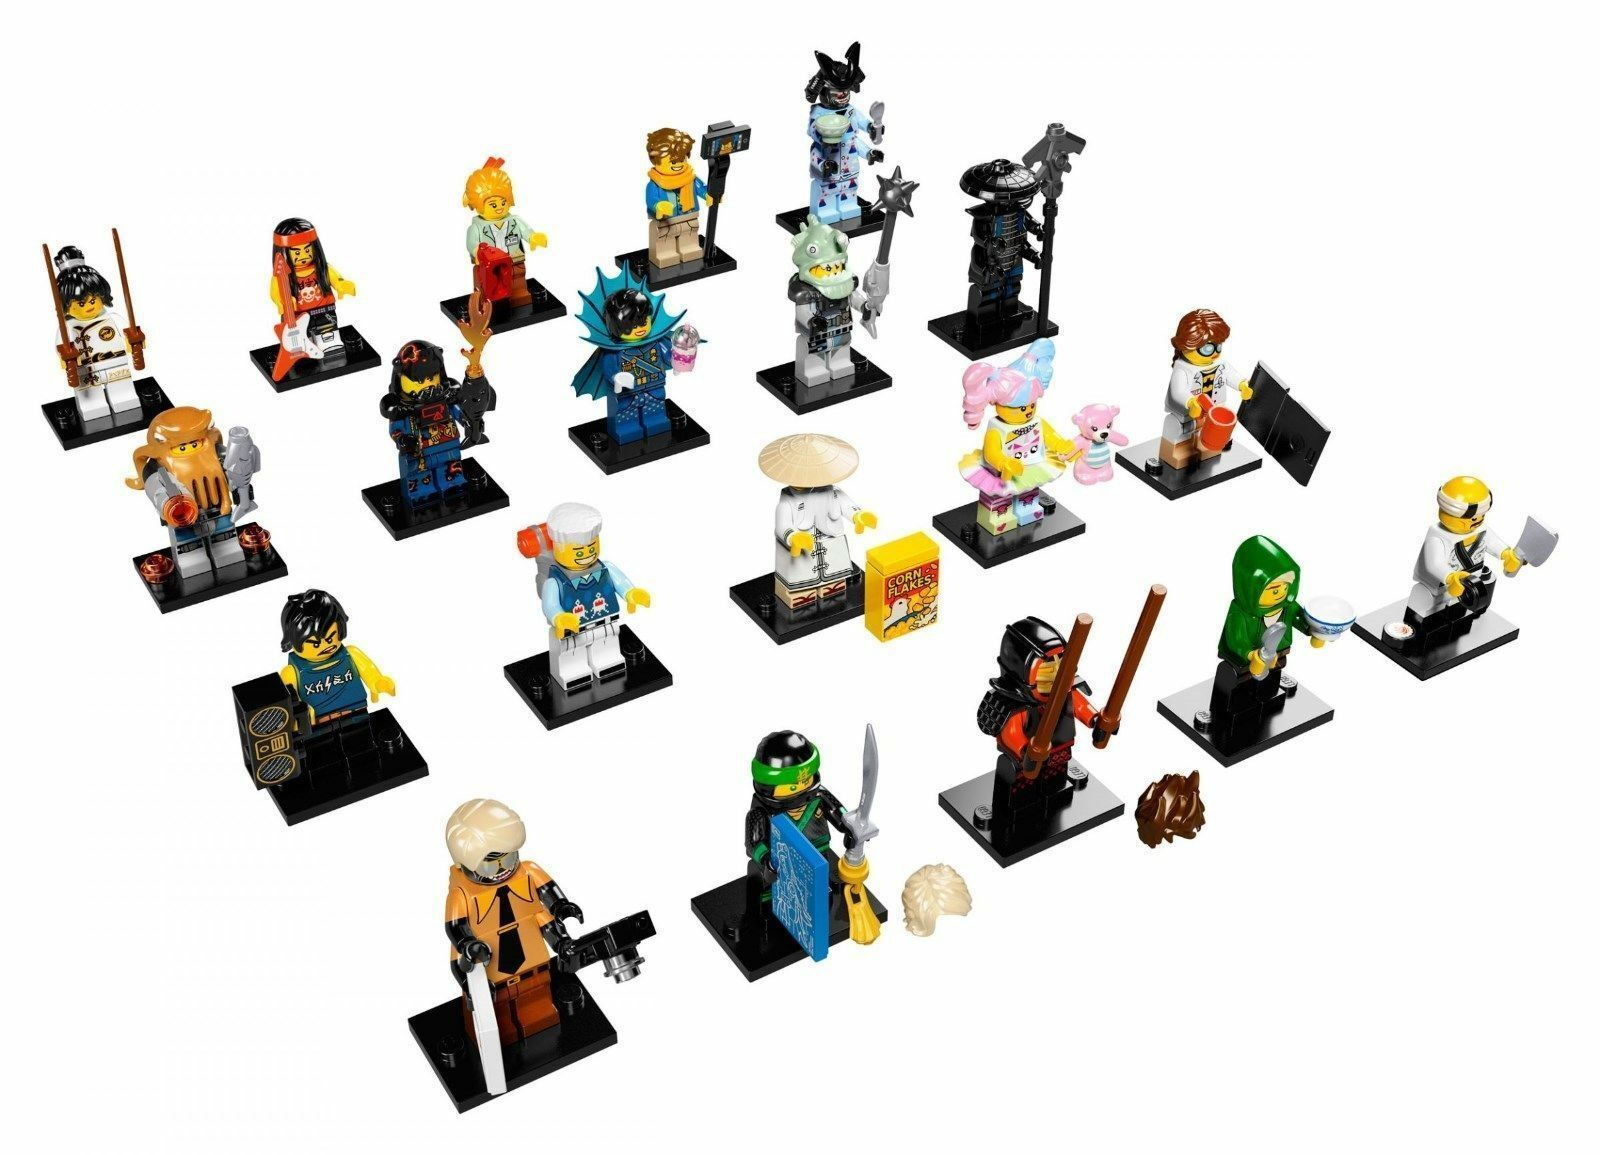 LEGO 71019 – 20 MINIFIGURES SERIE COMPLETA NINJAGO MOVIE SET 2017